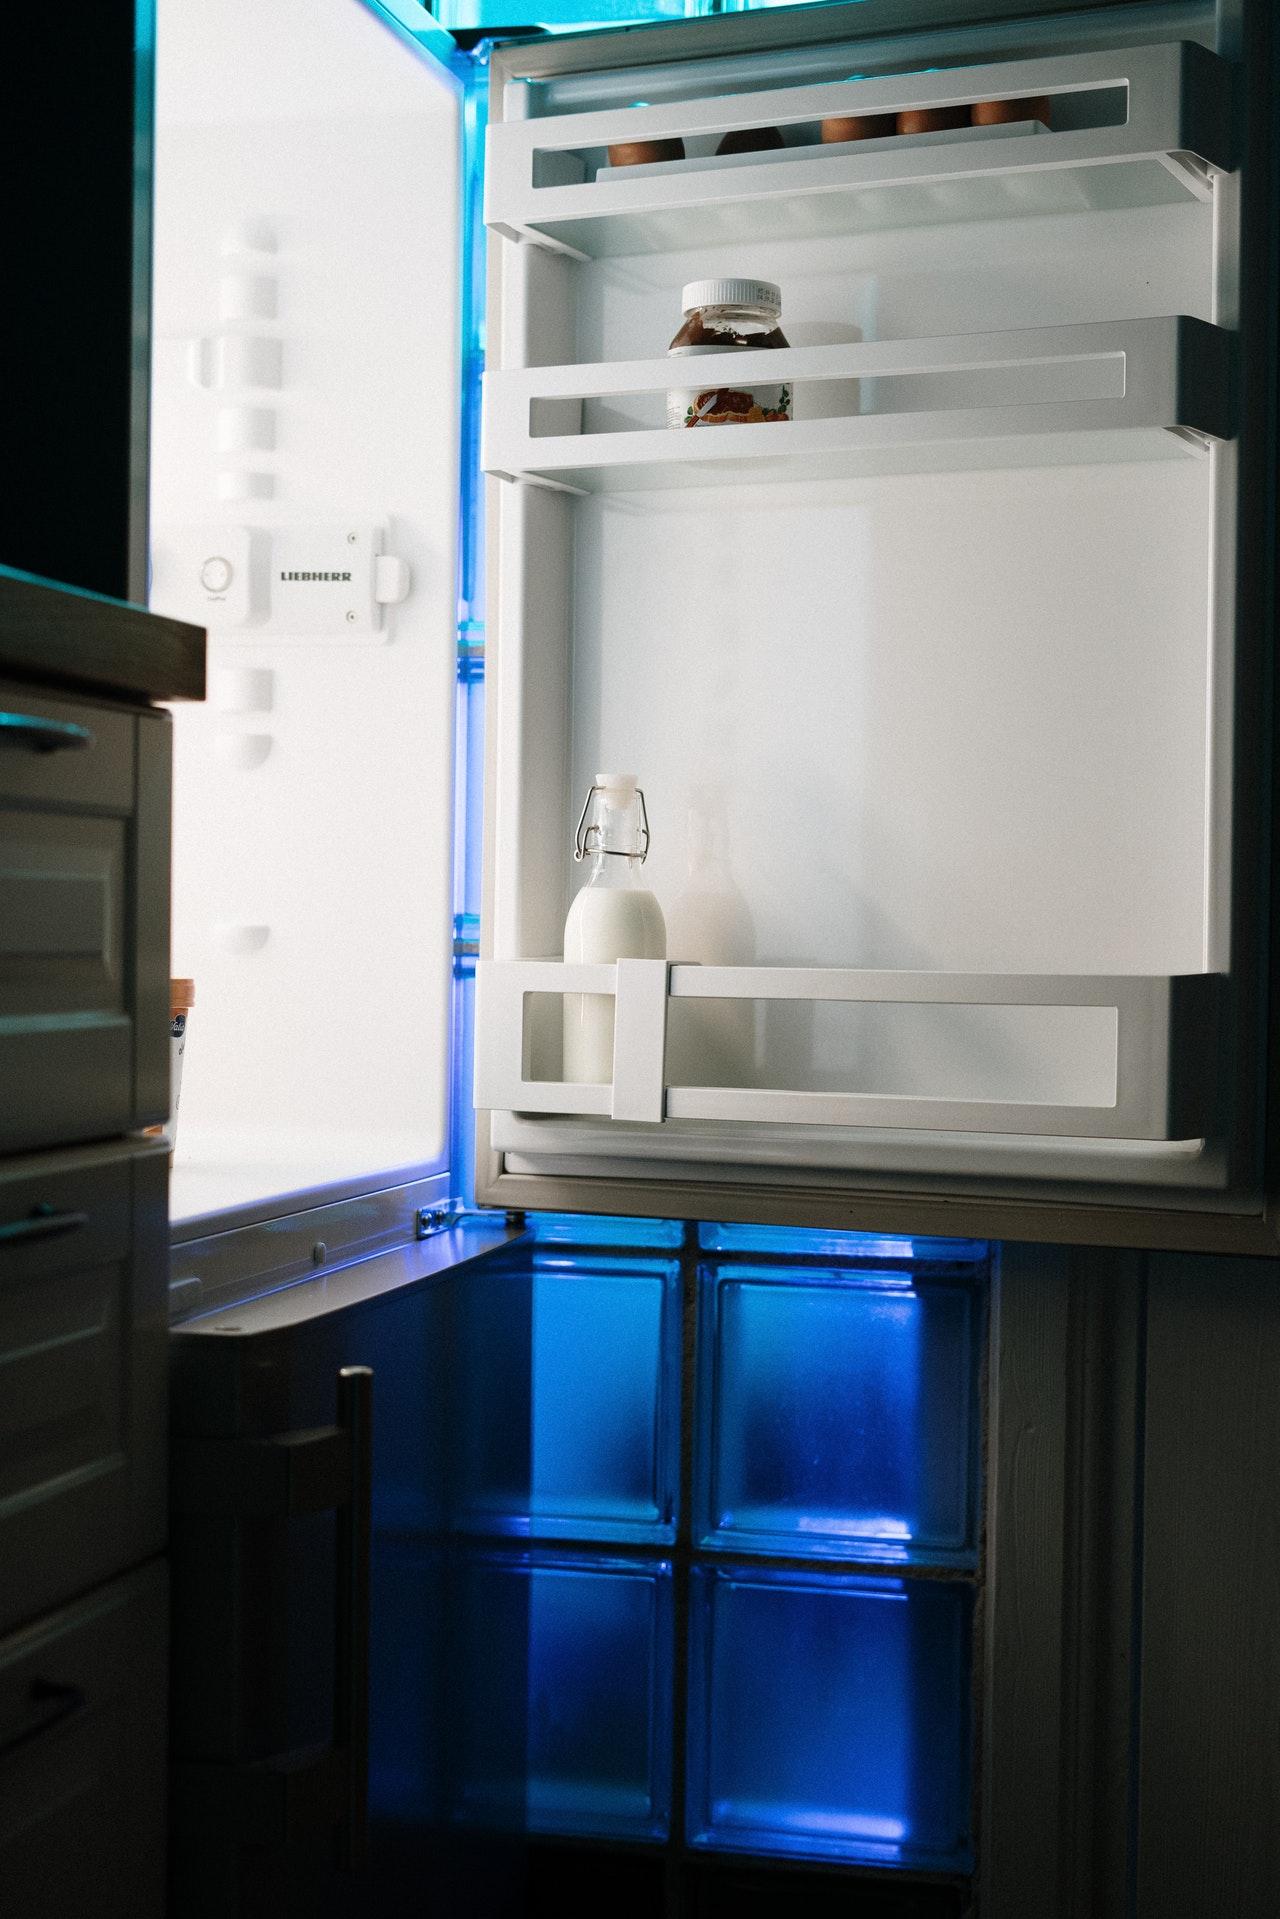 an opened refrigerator.